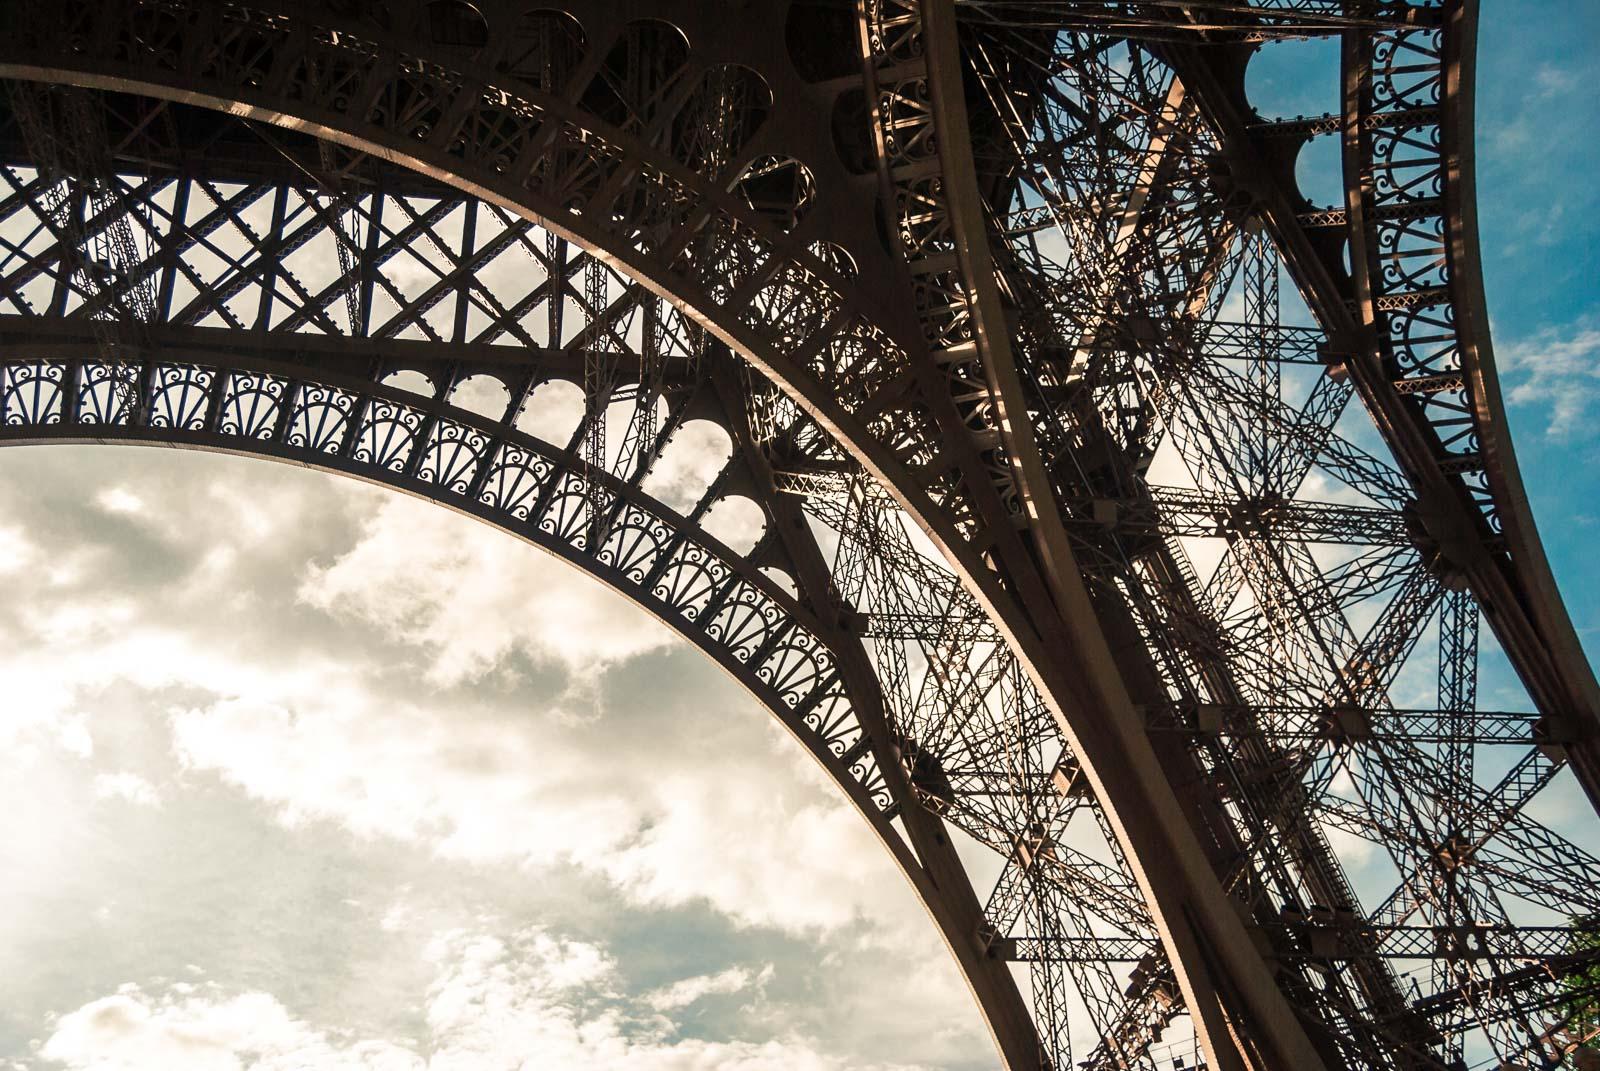 11_Paris-France-trip_Joseph-Barber-Photography.jpg